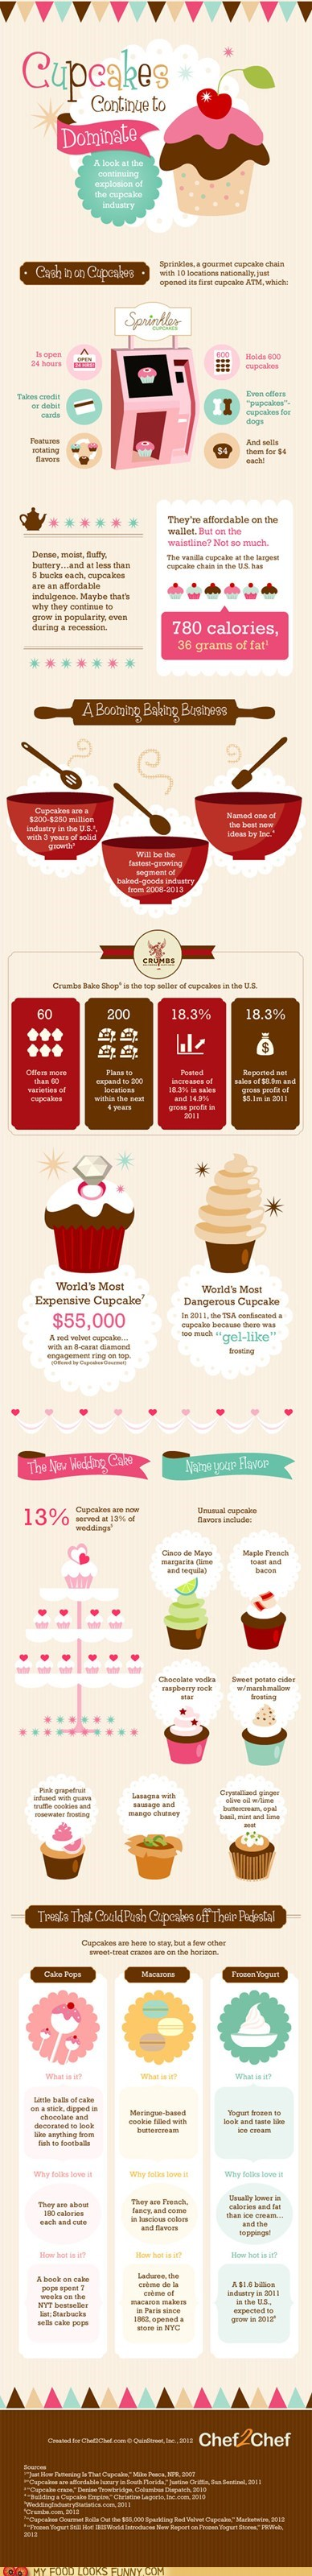 Cupcakes: The Trendening